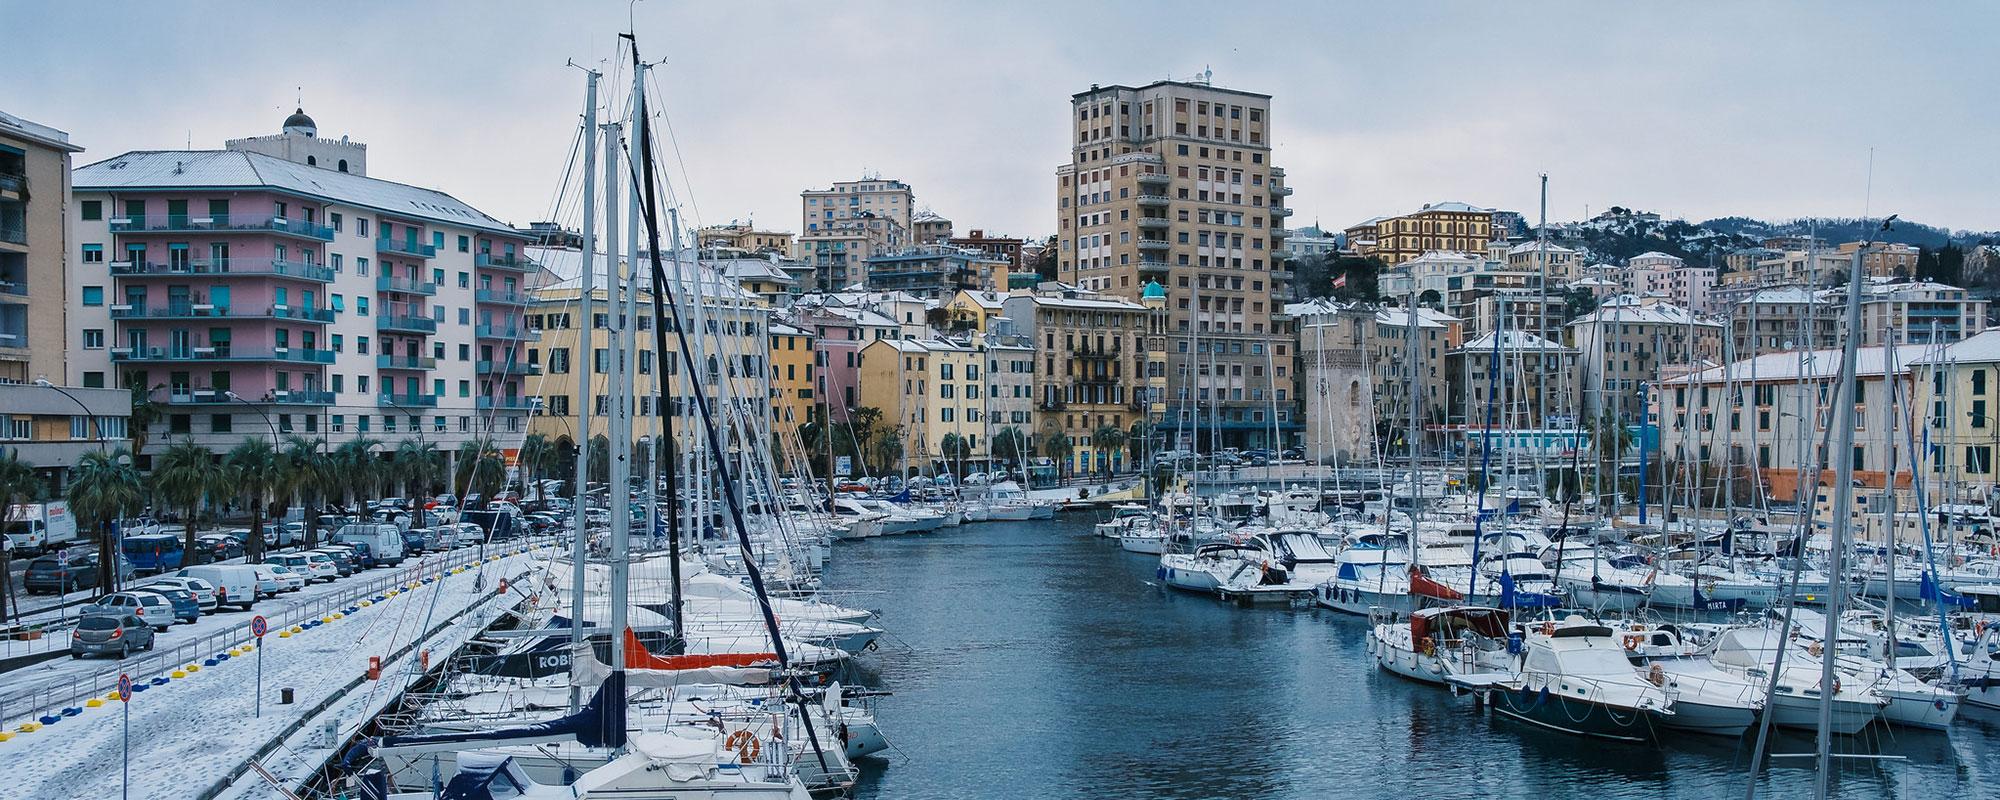 Savona, Riviera ligure di Ponente